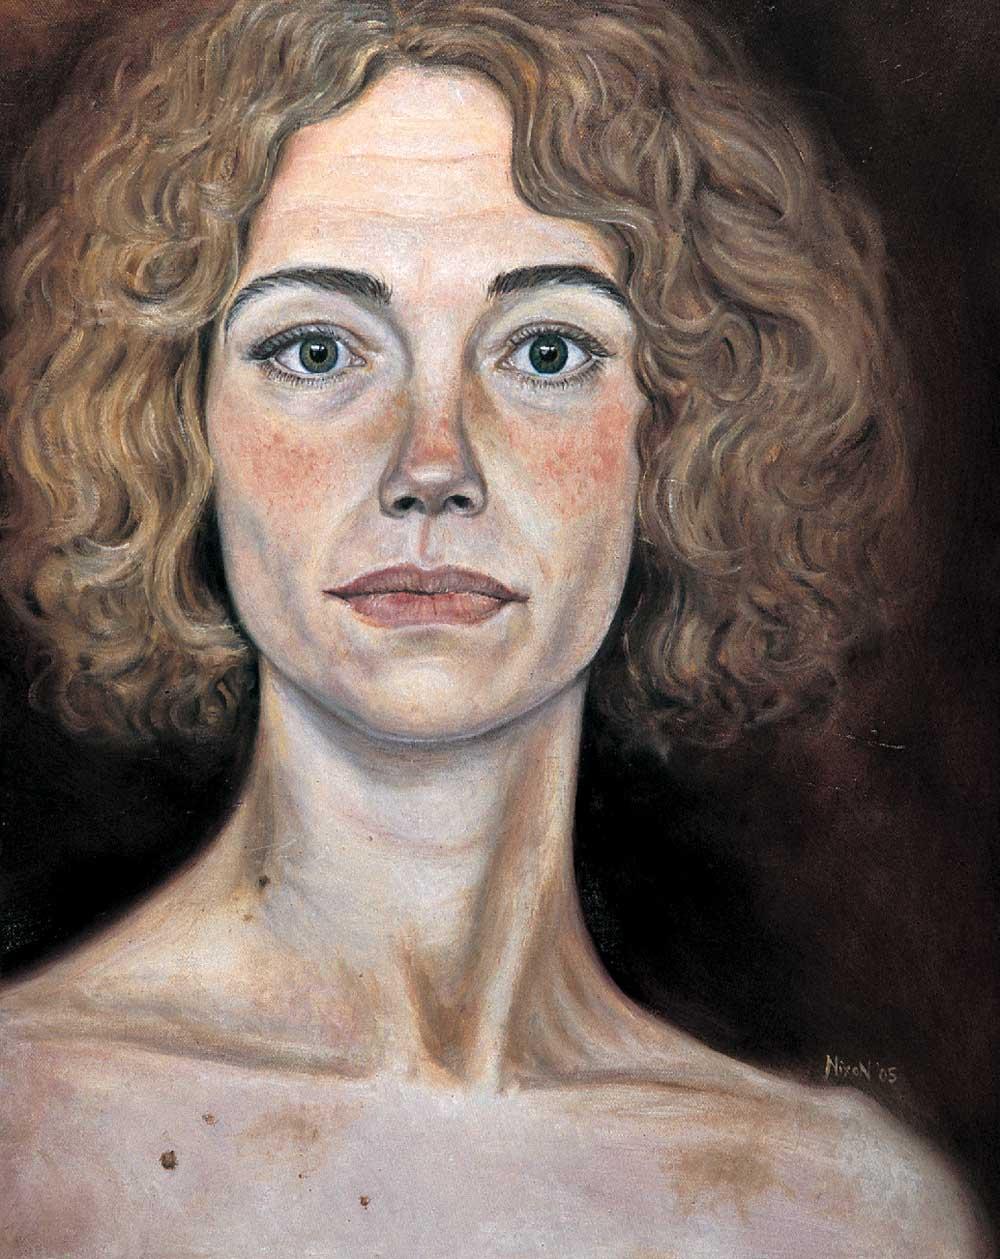 Self-portrait by Catherine Nixon